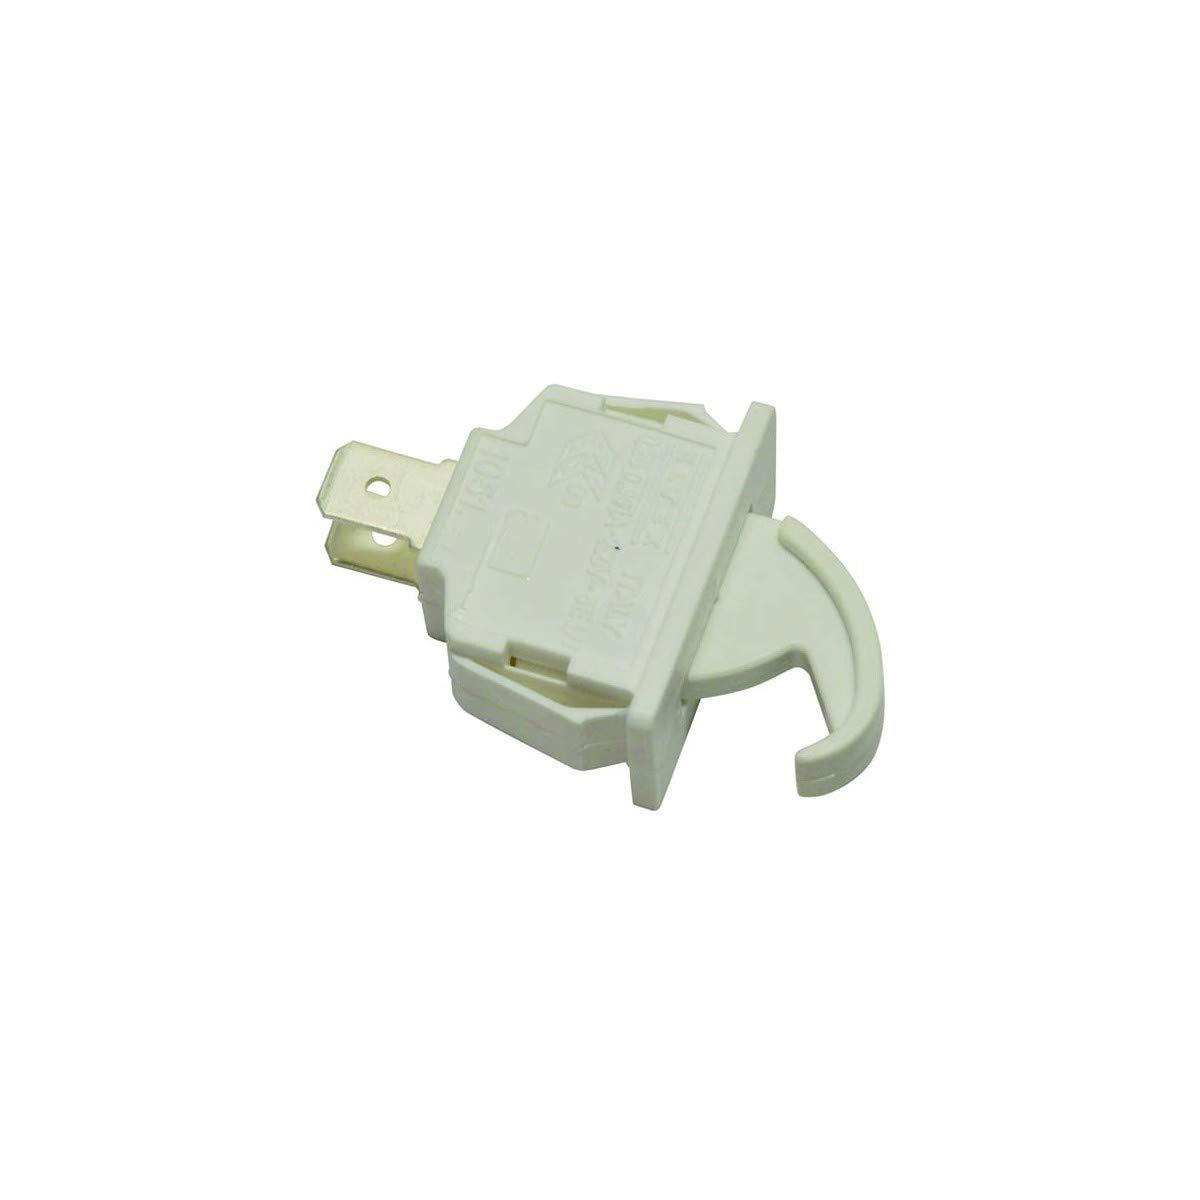 Recamania Interruptor luz frigorífico FAGOR AS0000494: Amazon.es